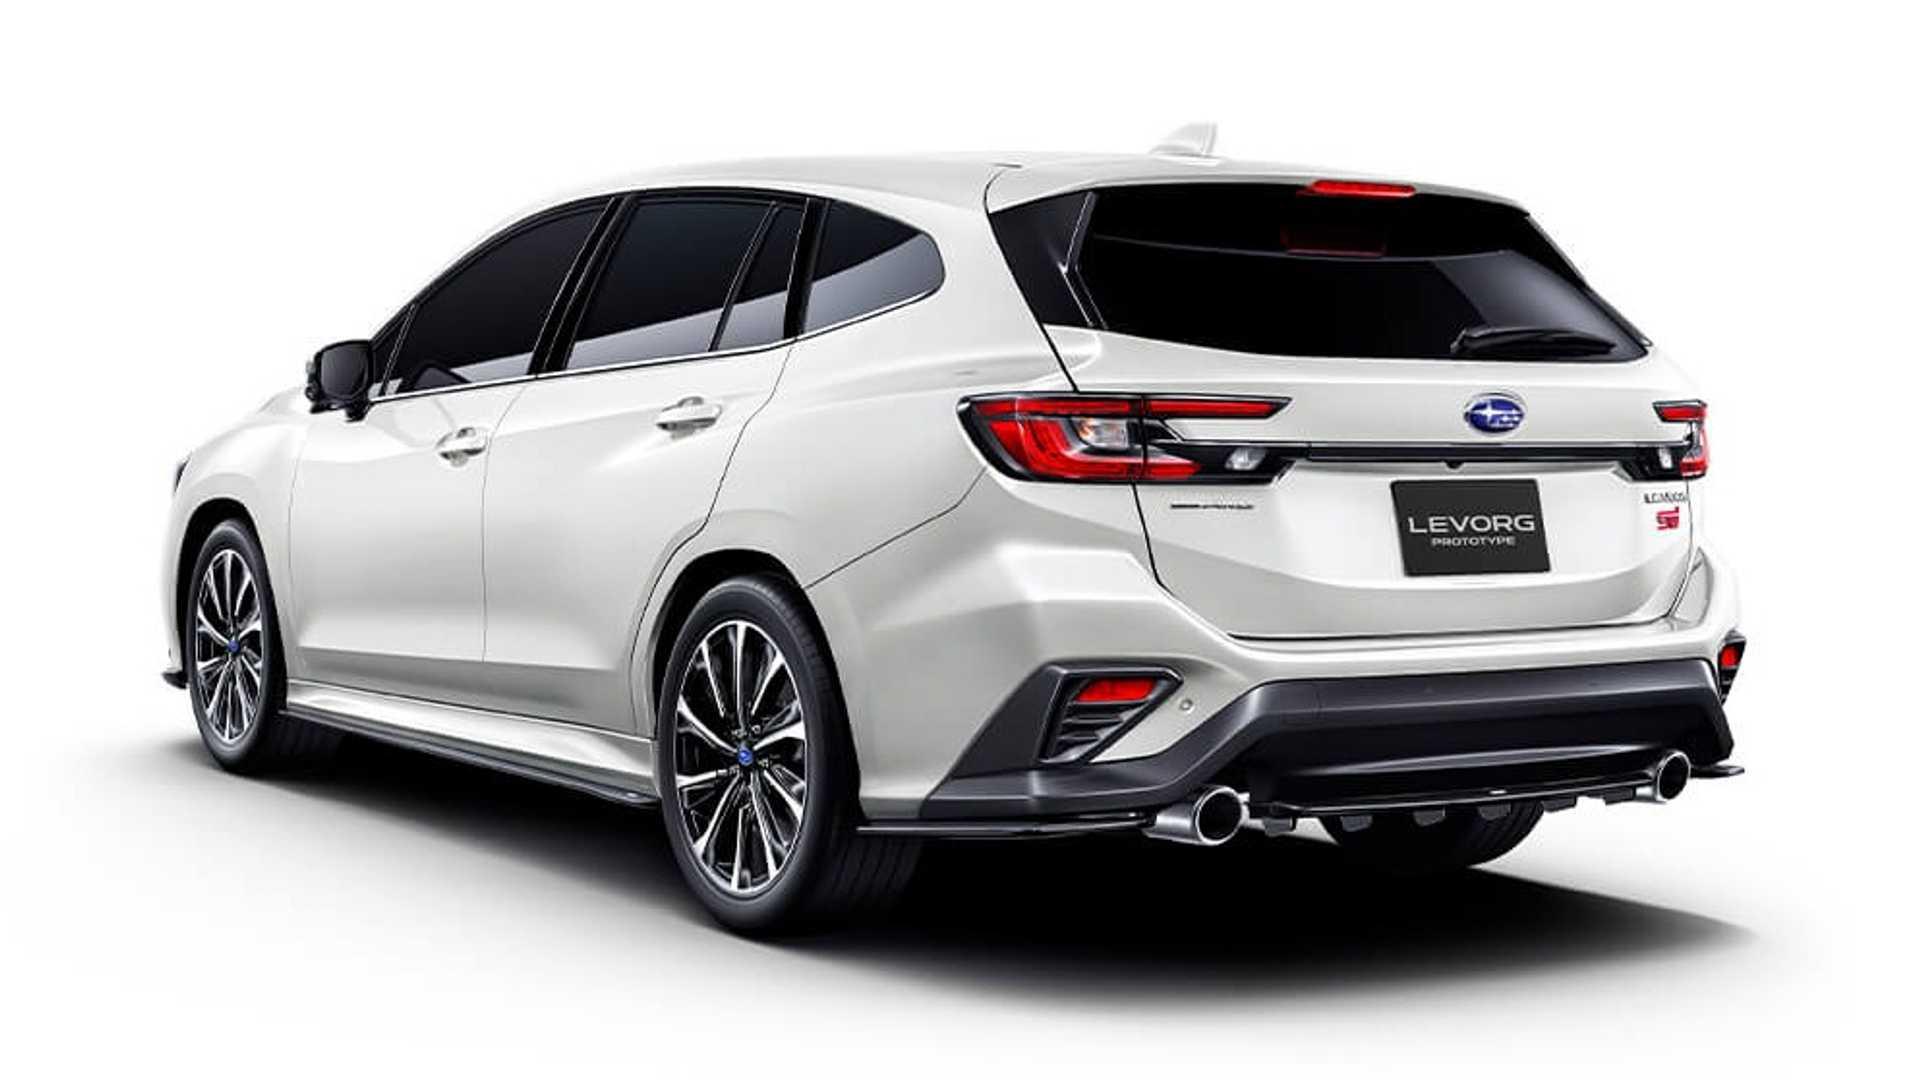 Subaru-Levorg-STI-Sport-Prototype-8